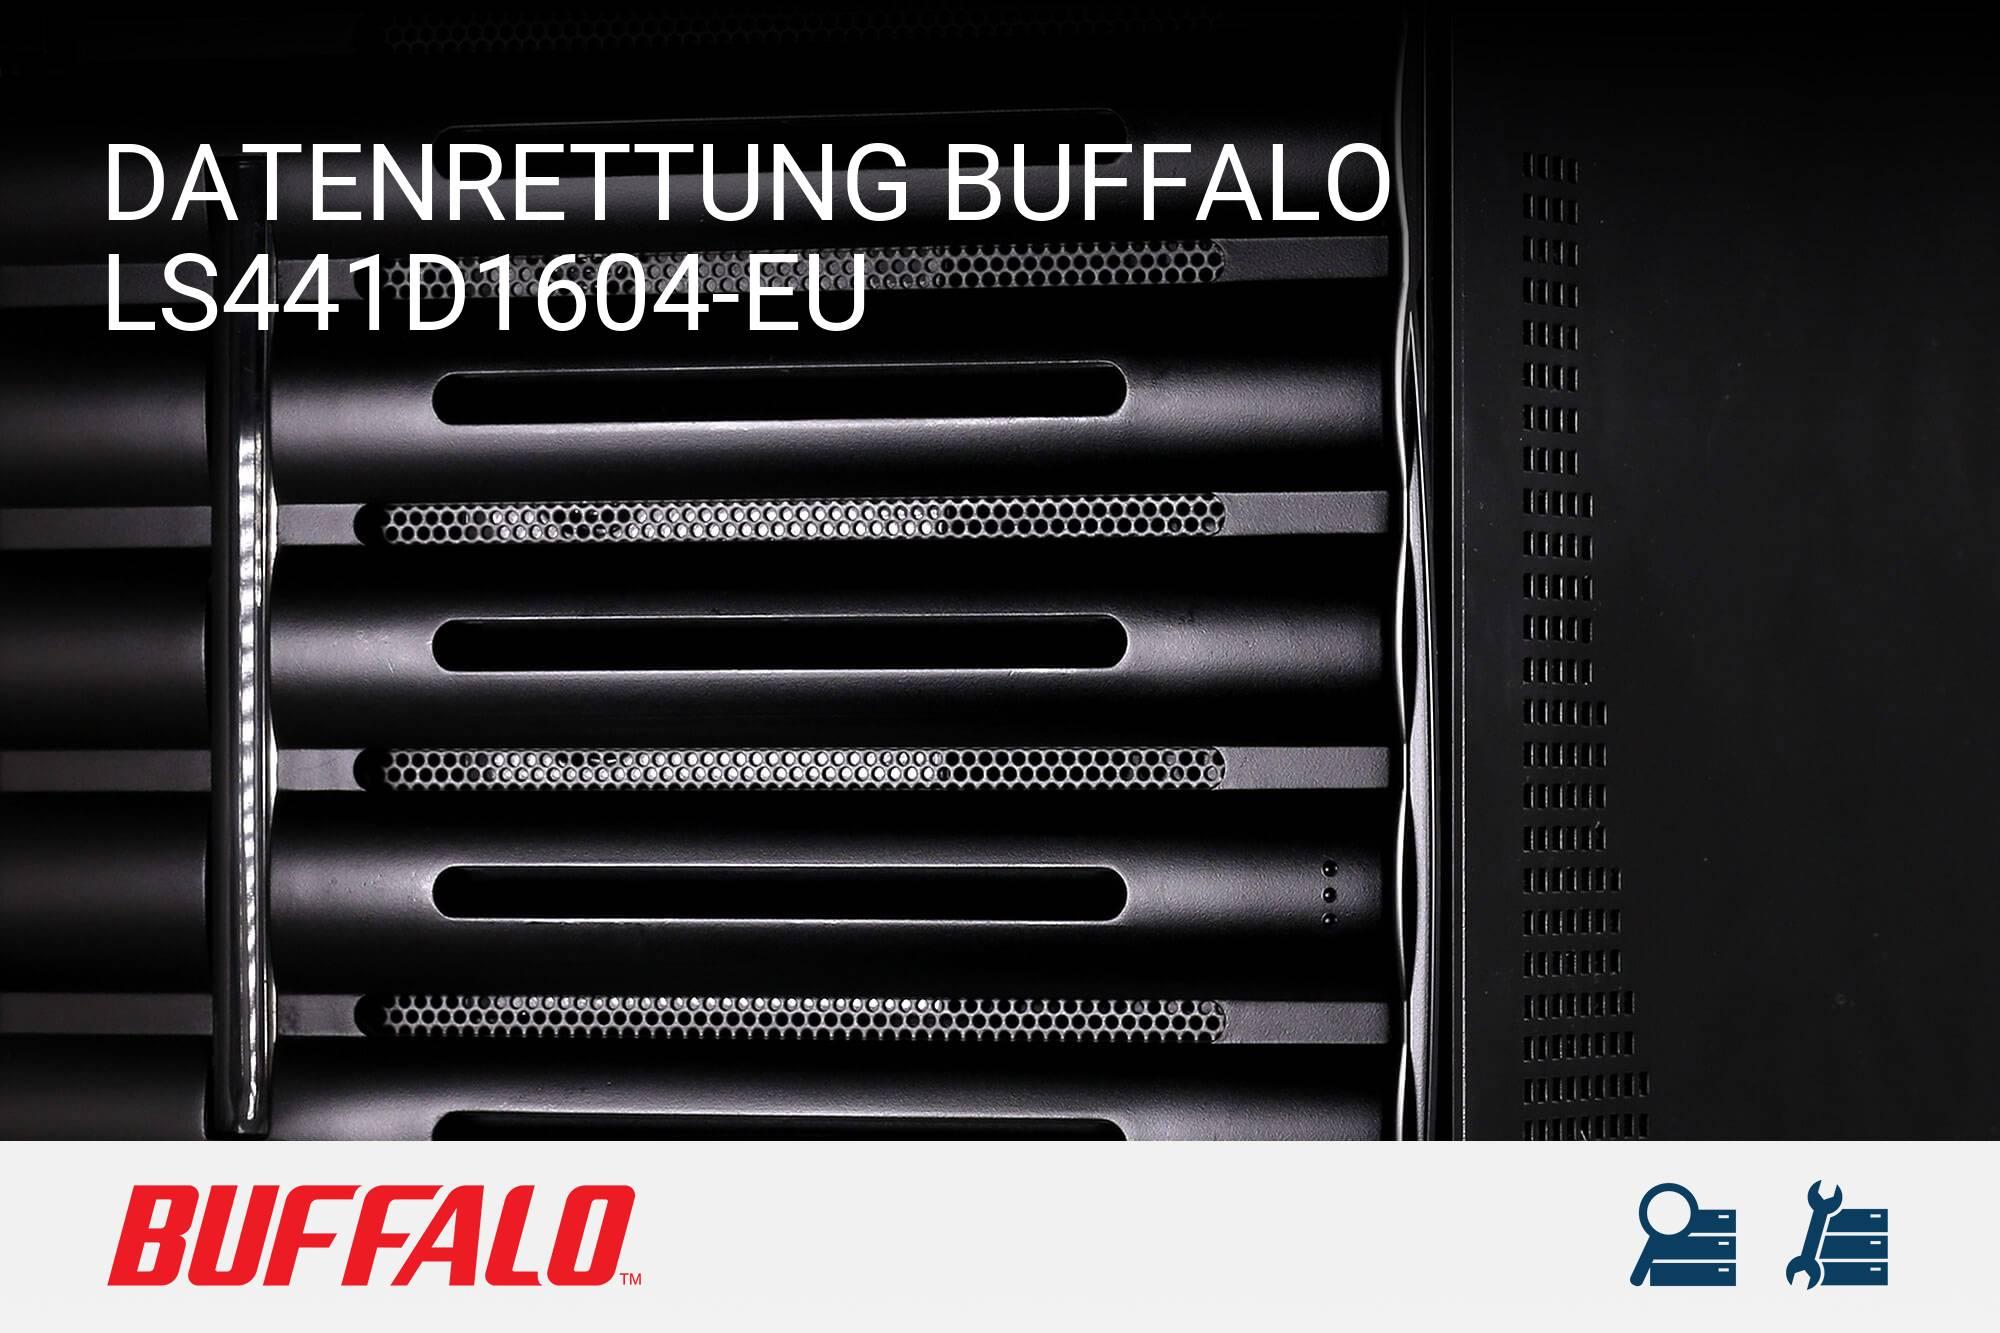 Buffalo LS441D1604-EU